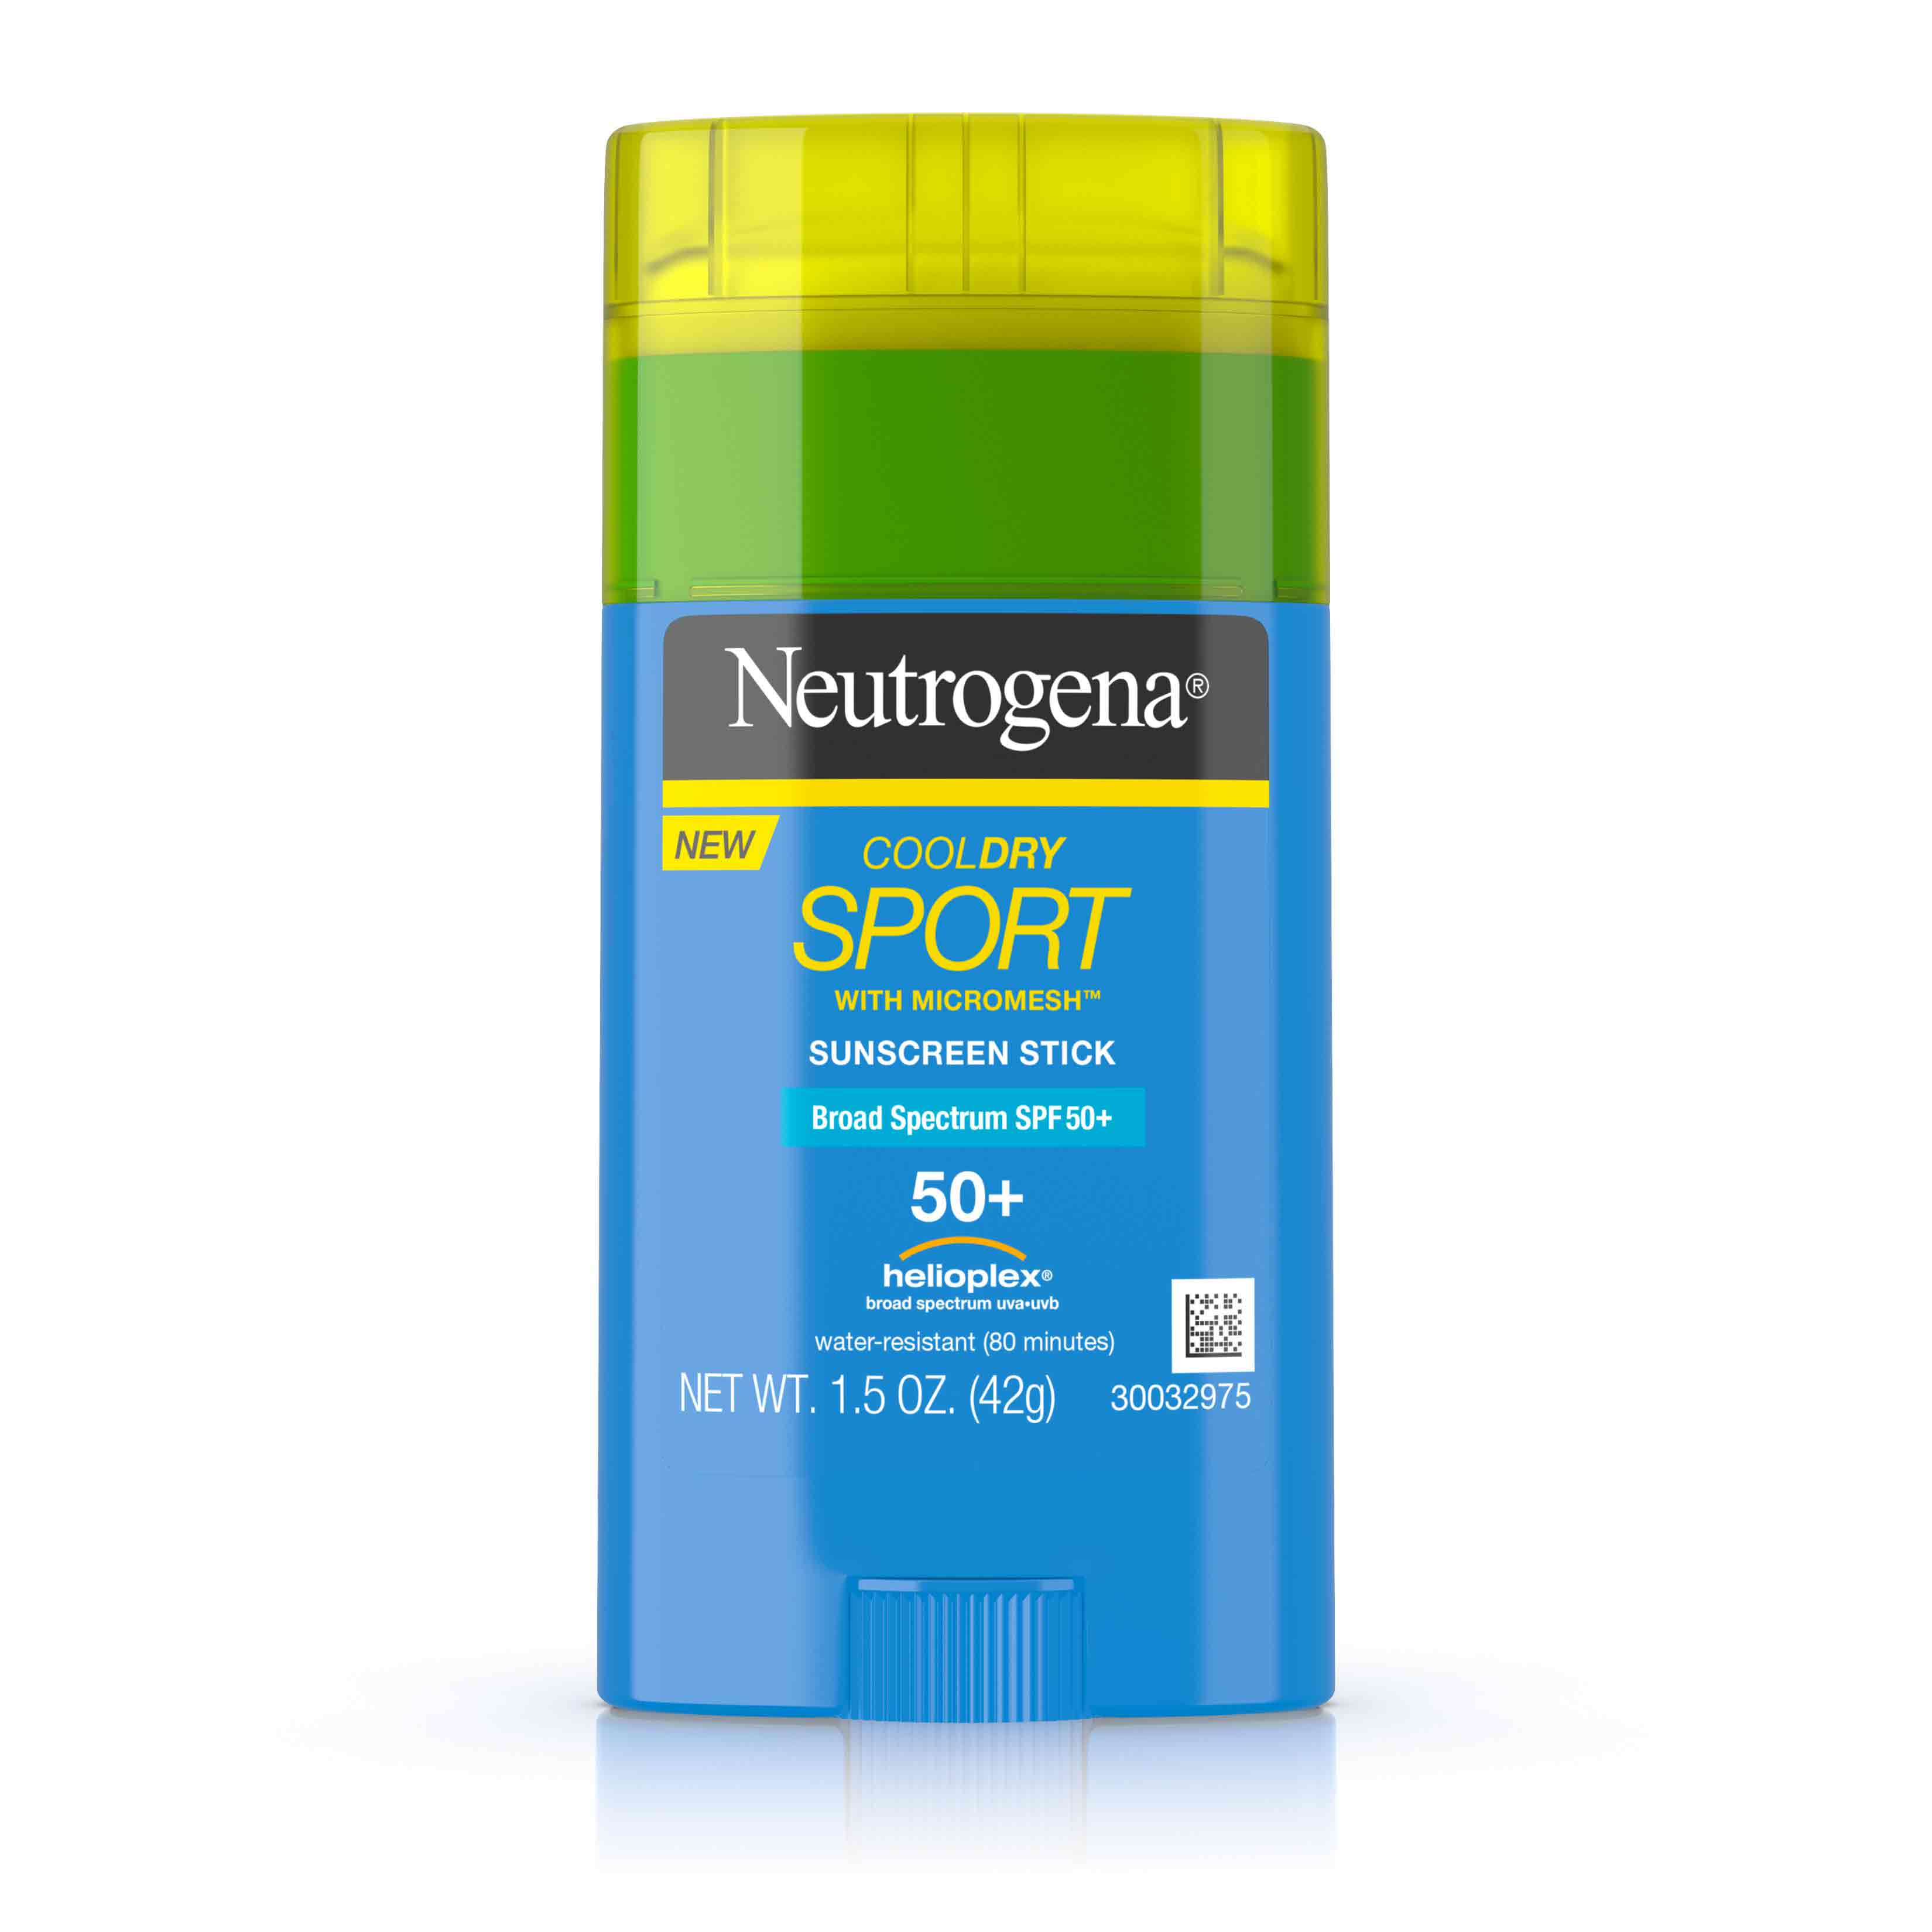 CoolDry Sport Sunscreen Stick Broad Spectrum SPF 50+